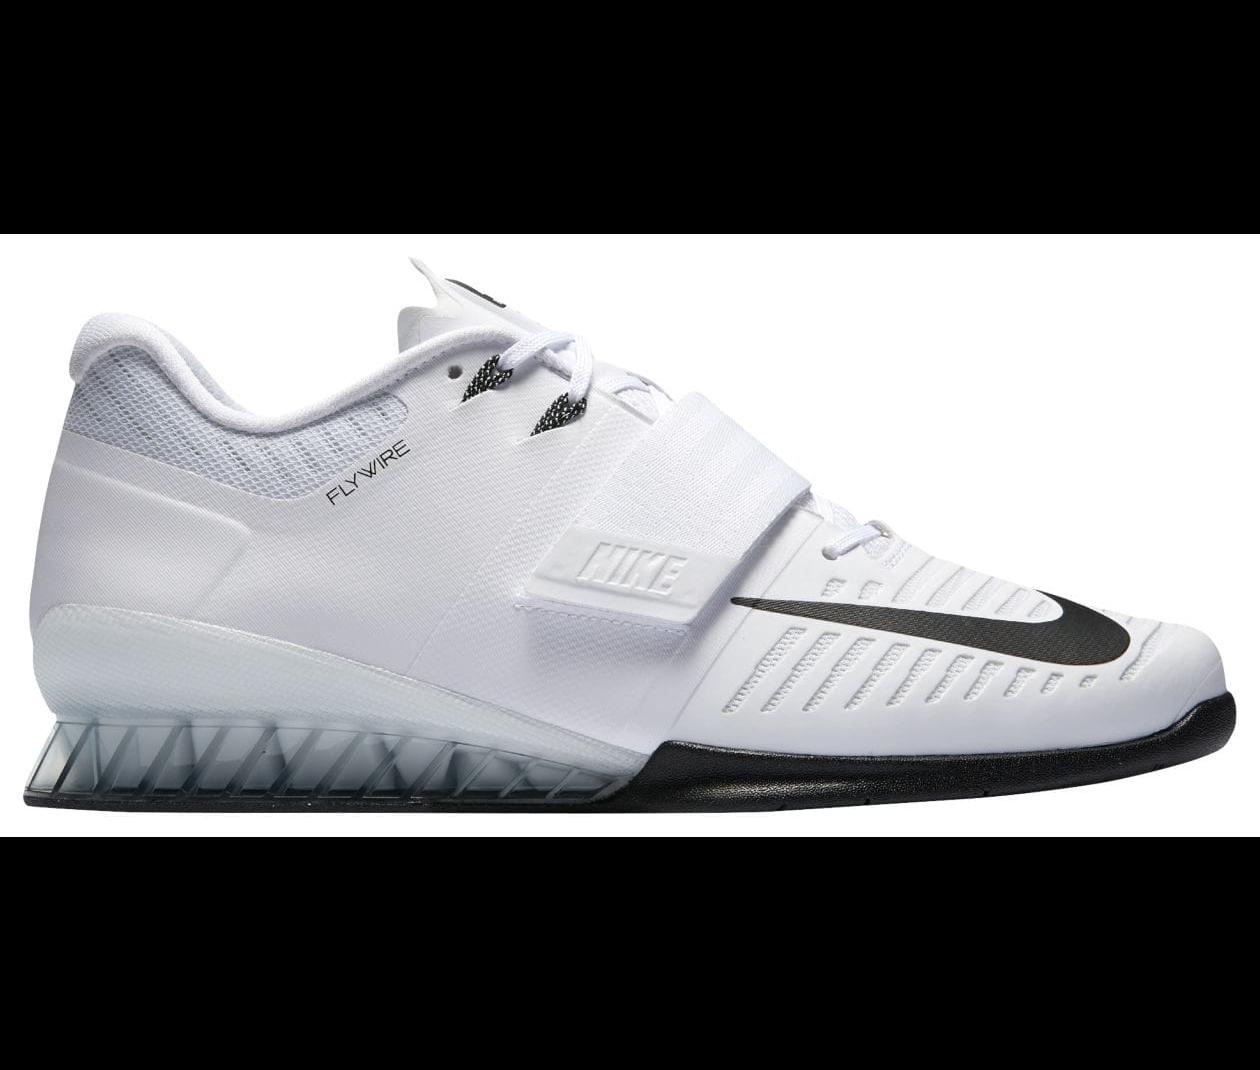 Nike Romaleos 3 - $128 + tax (Free Shipping)